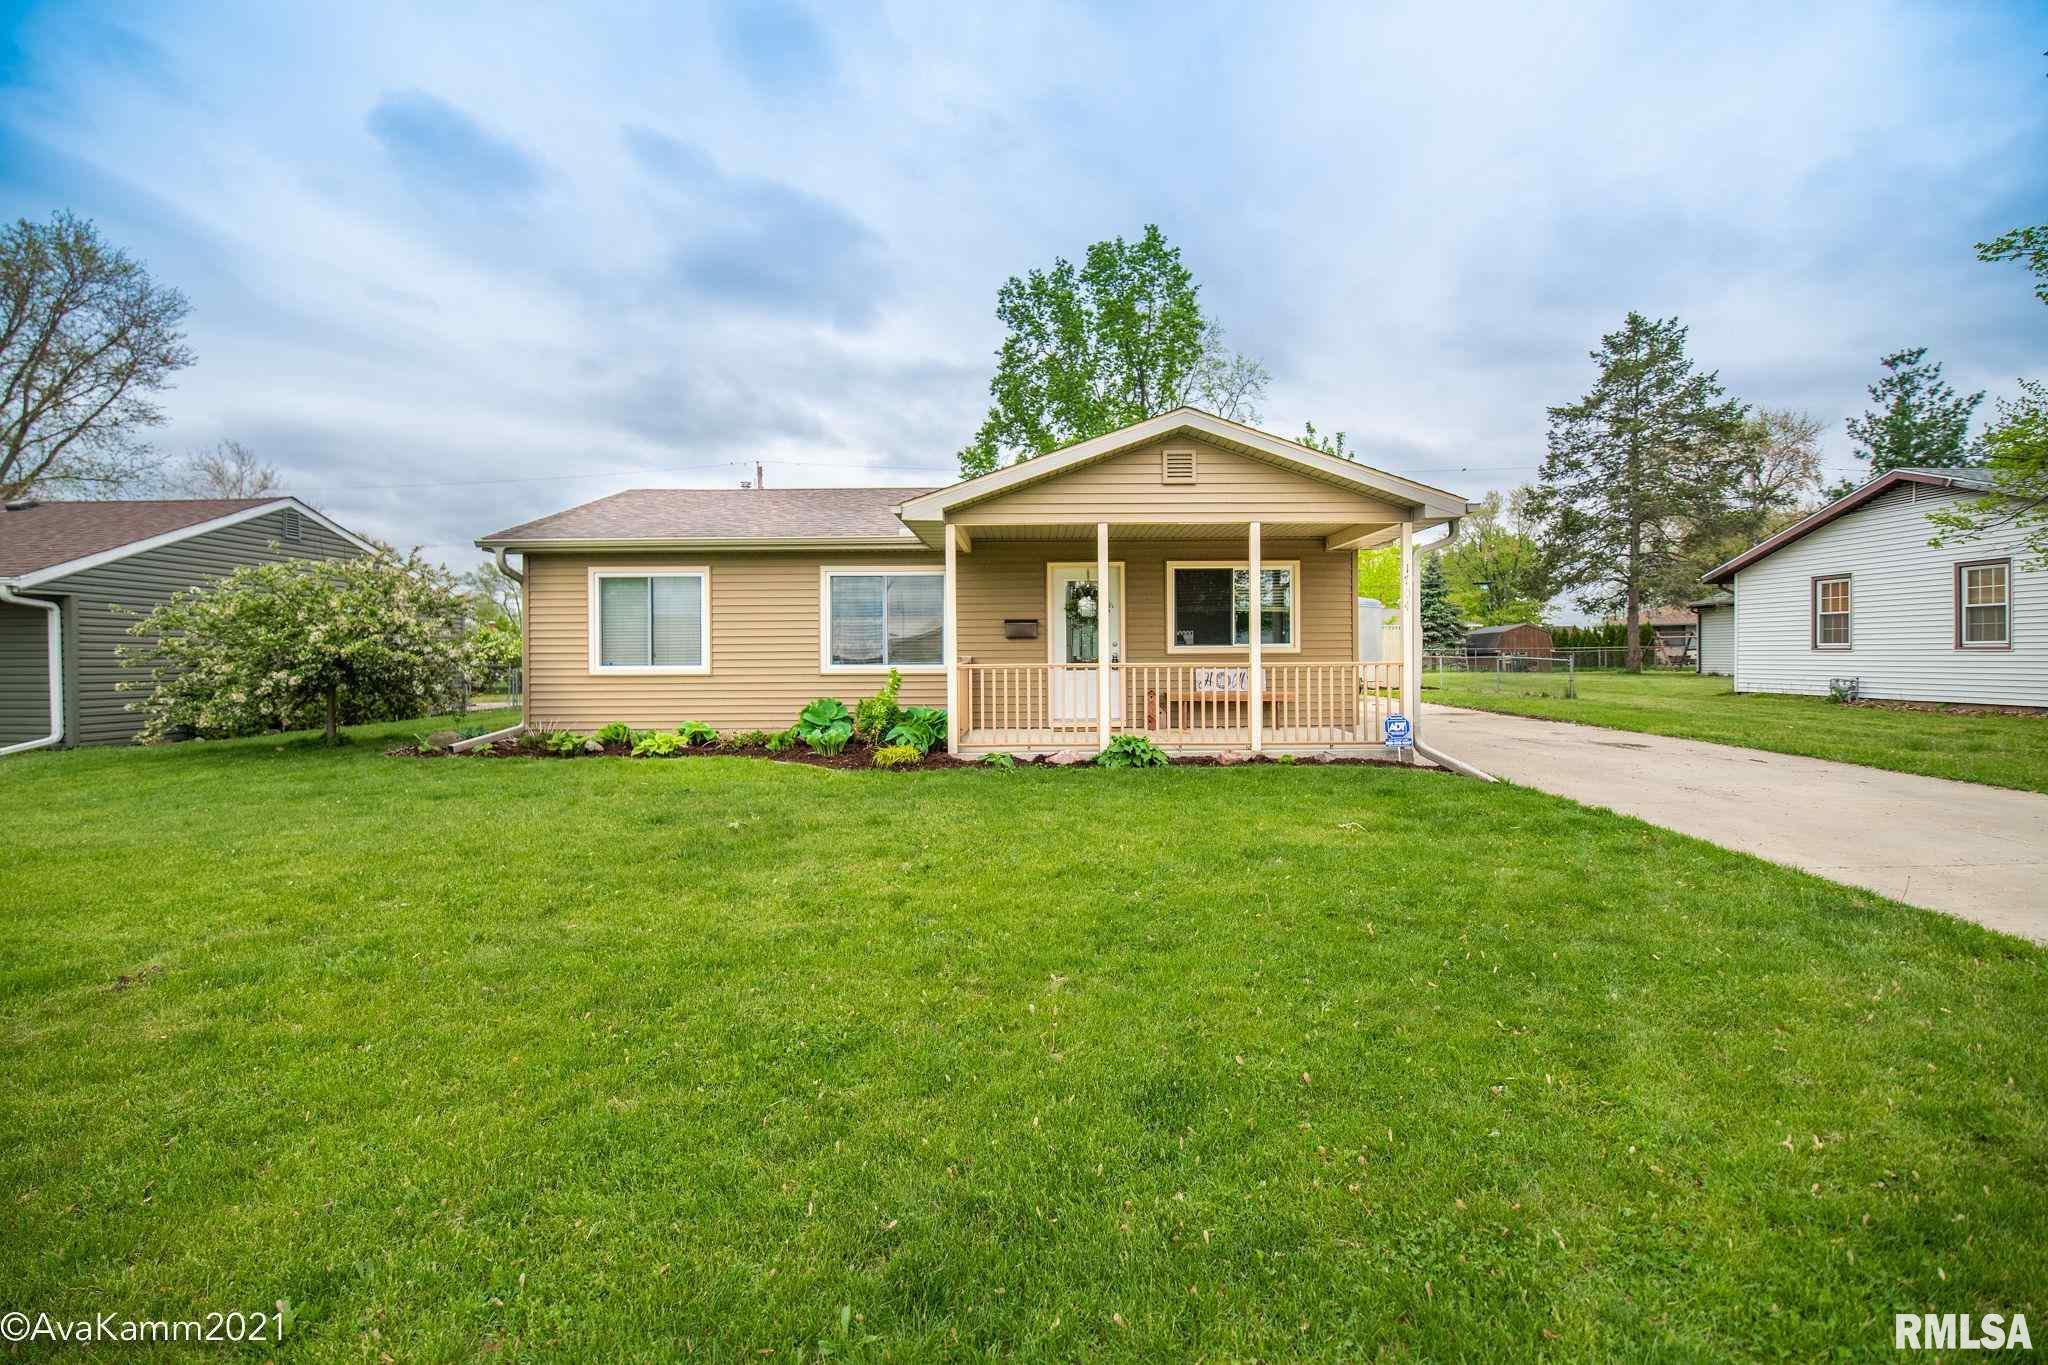 1704 W LEONARD Property Photo - Chillicothe, IL real estate listing